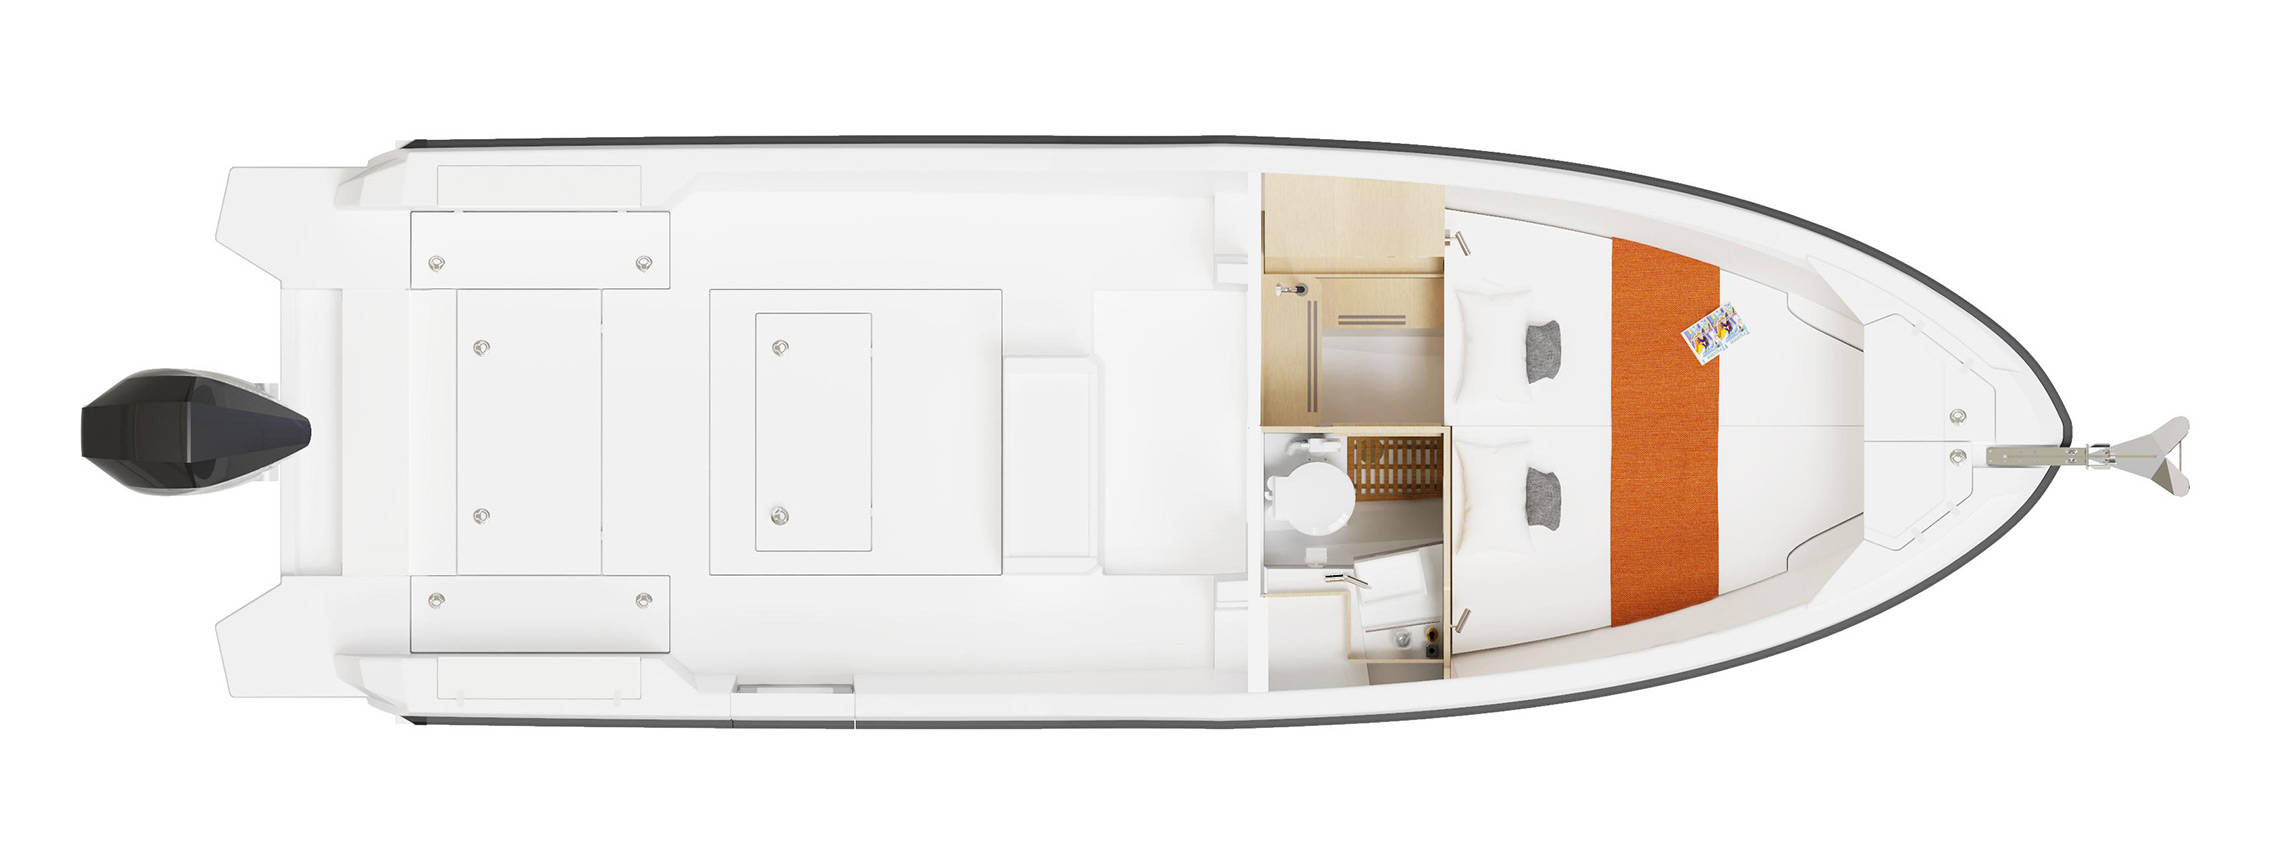 The D28 WA's Interior Floorplan